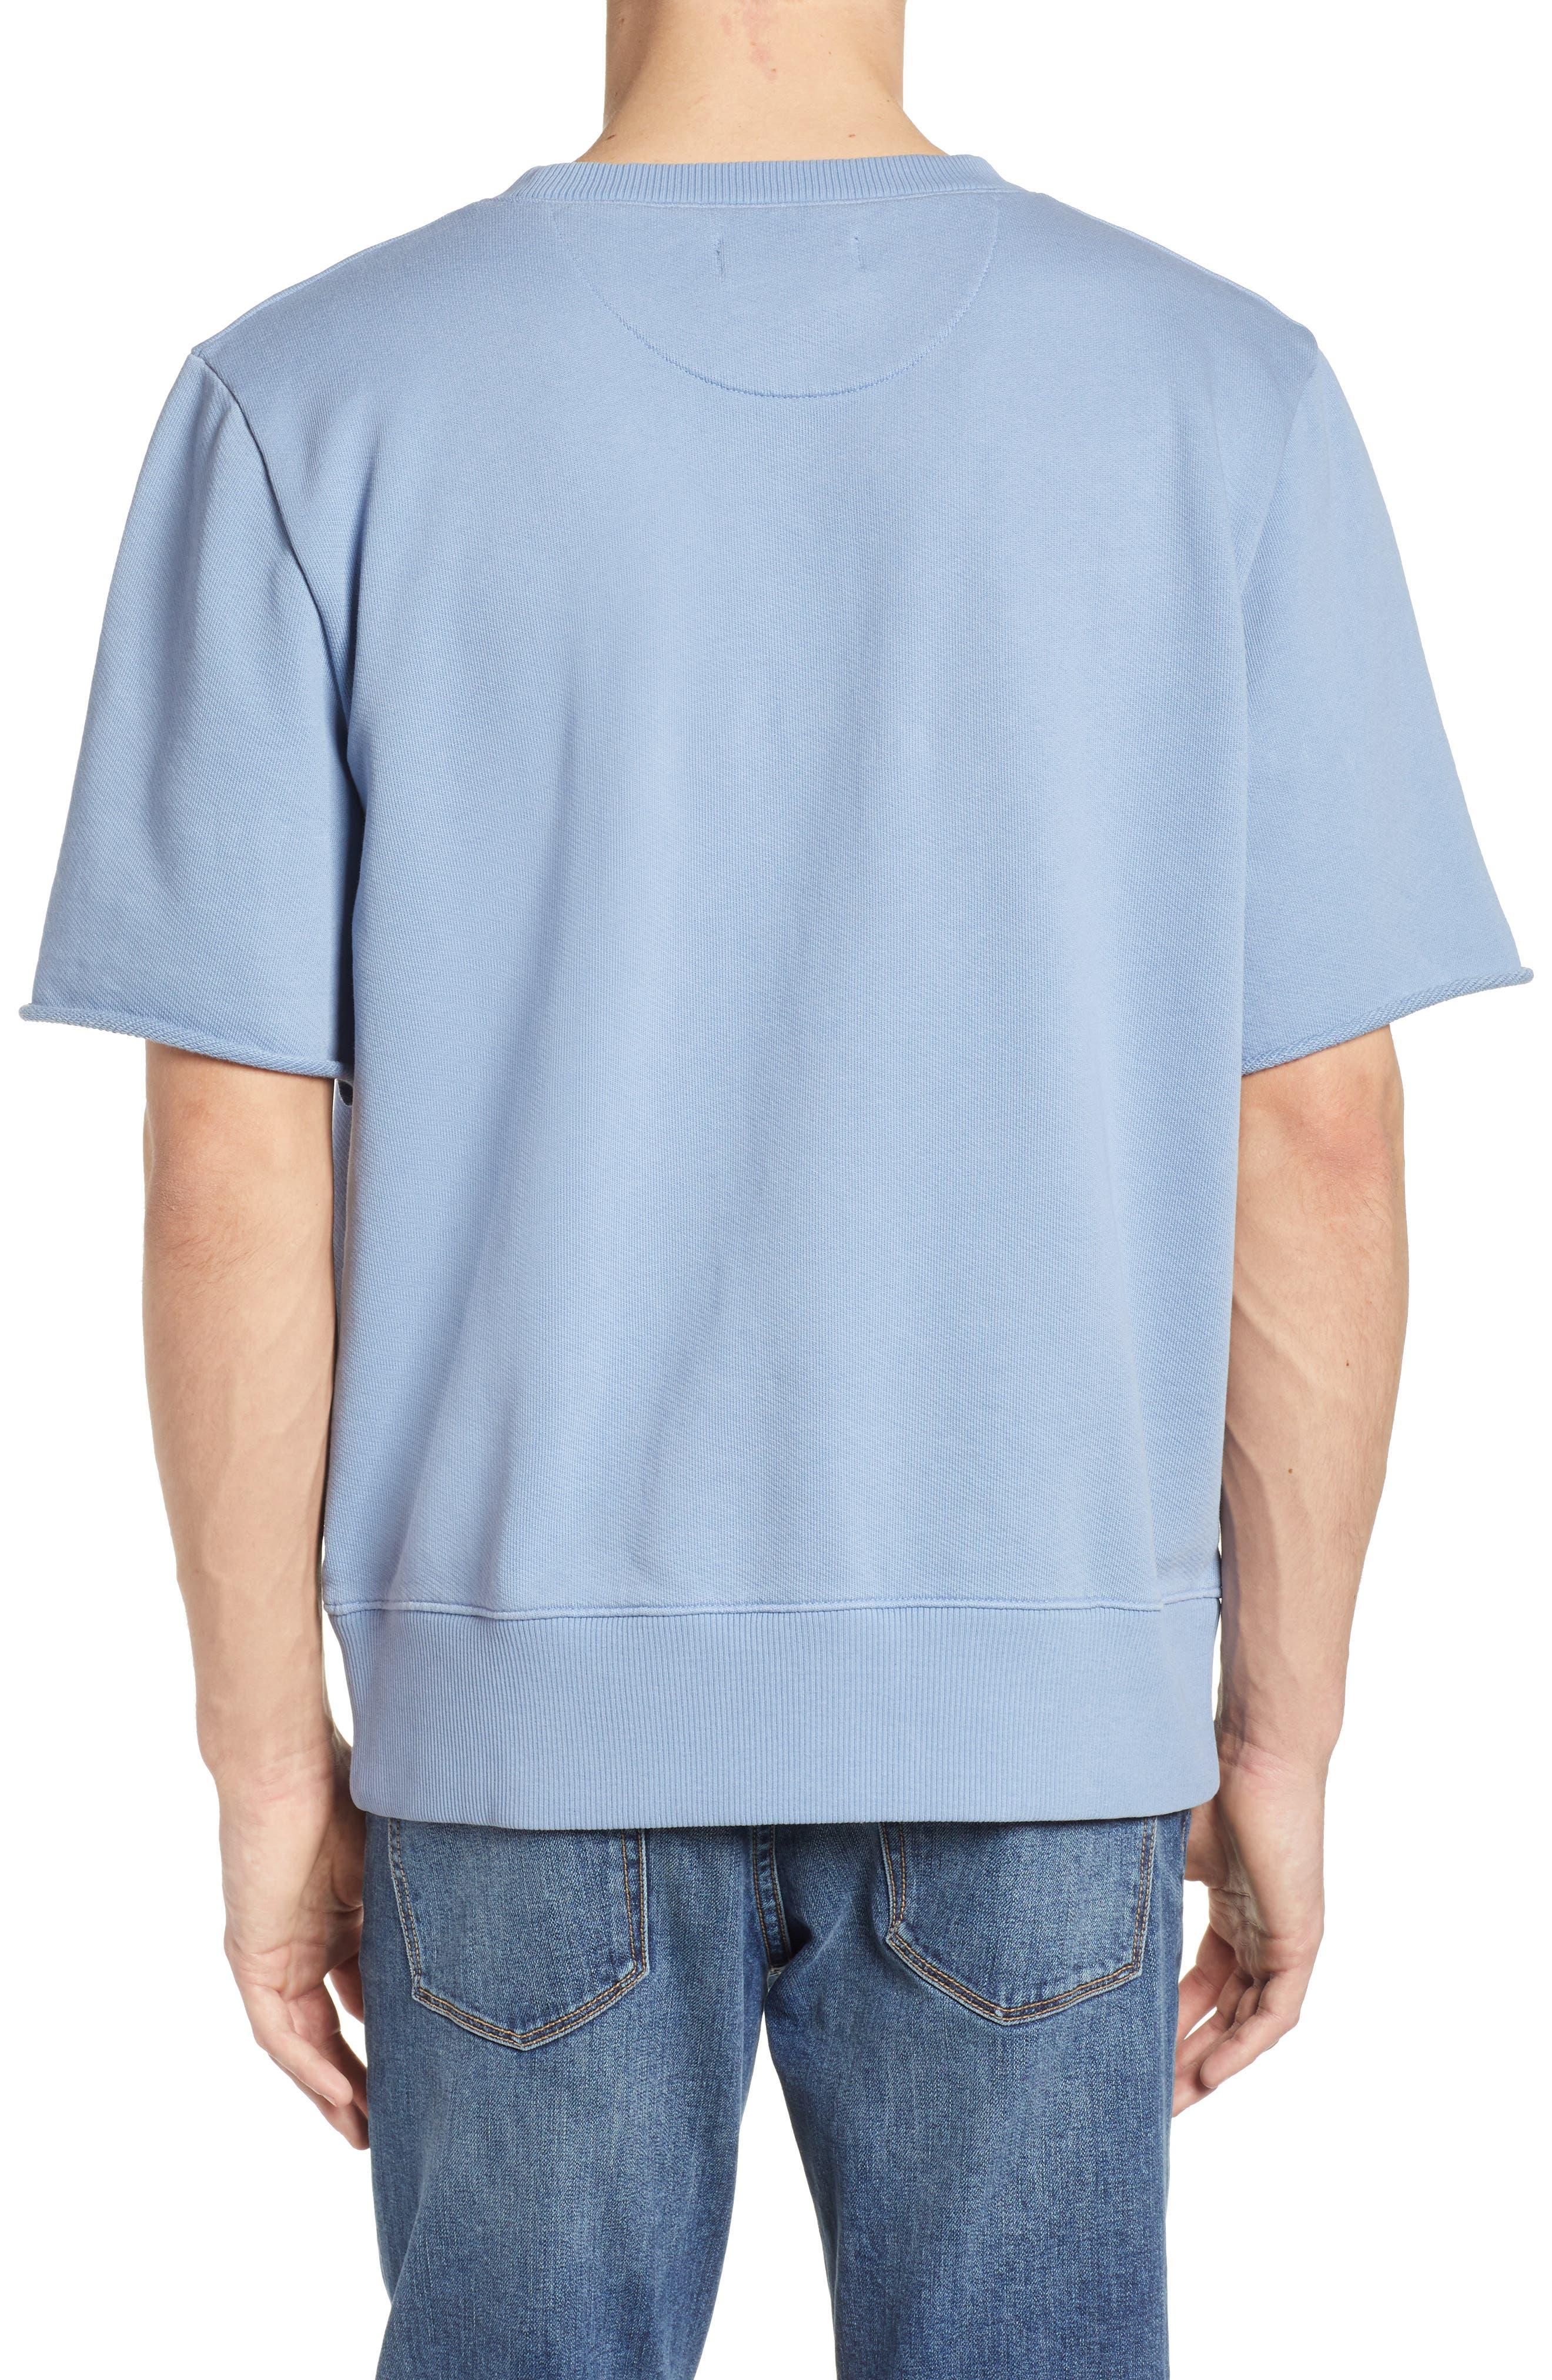 Cotton Terry Sweatshirt,                             Alternate thumbnail 3, color,